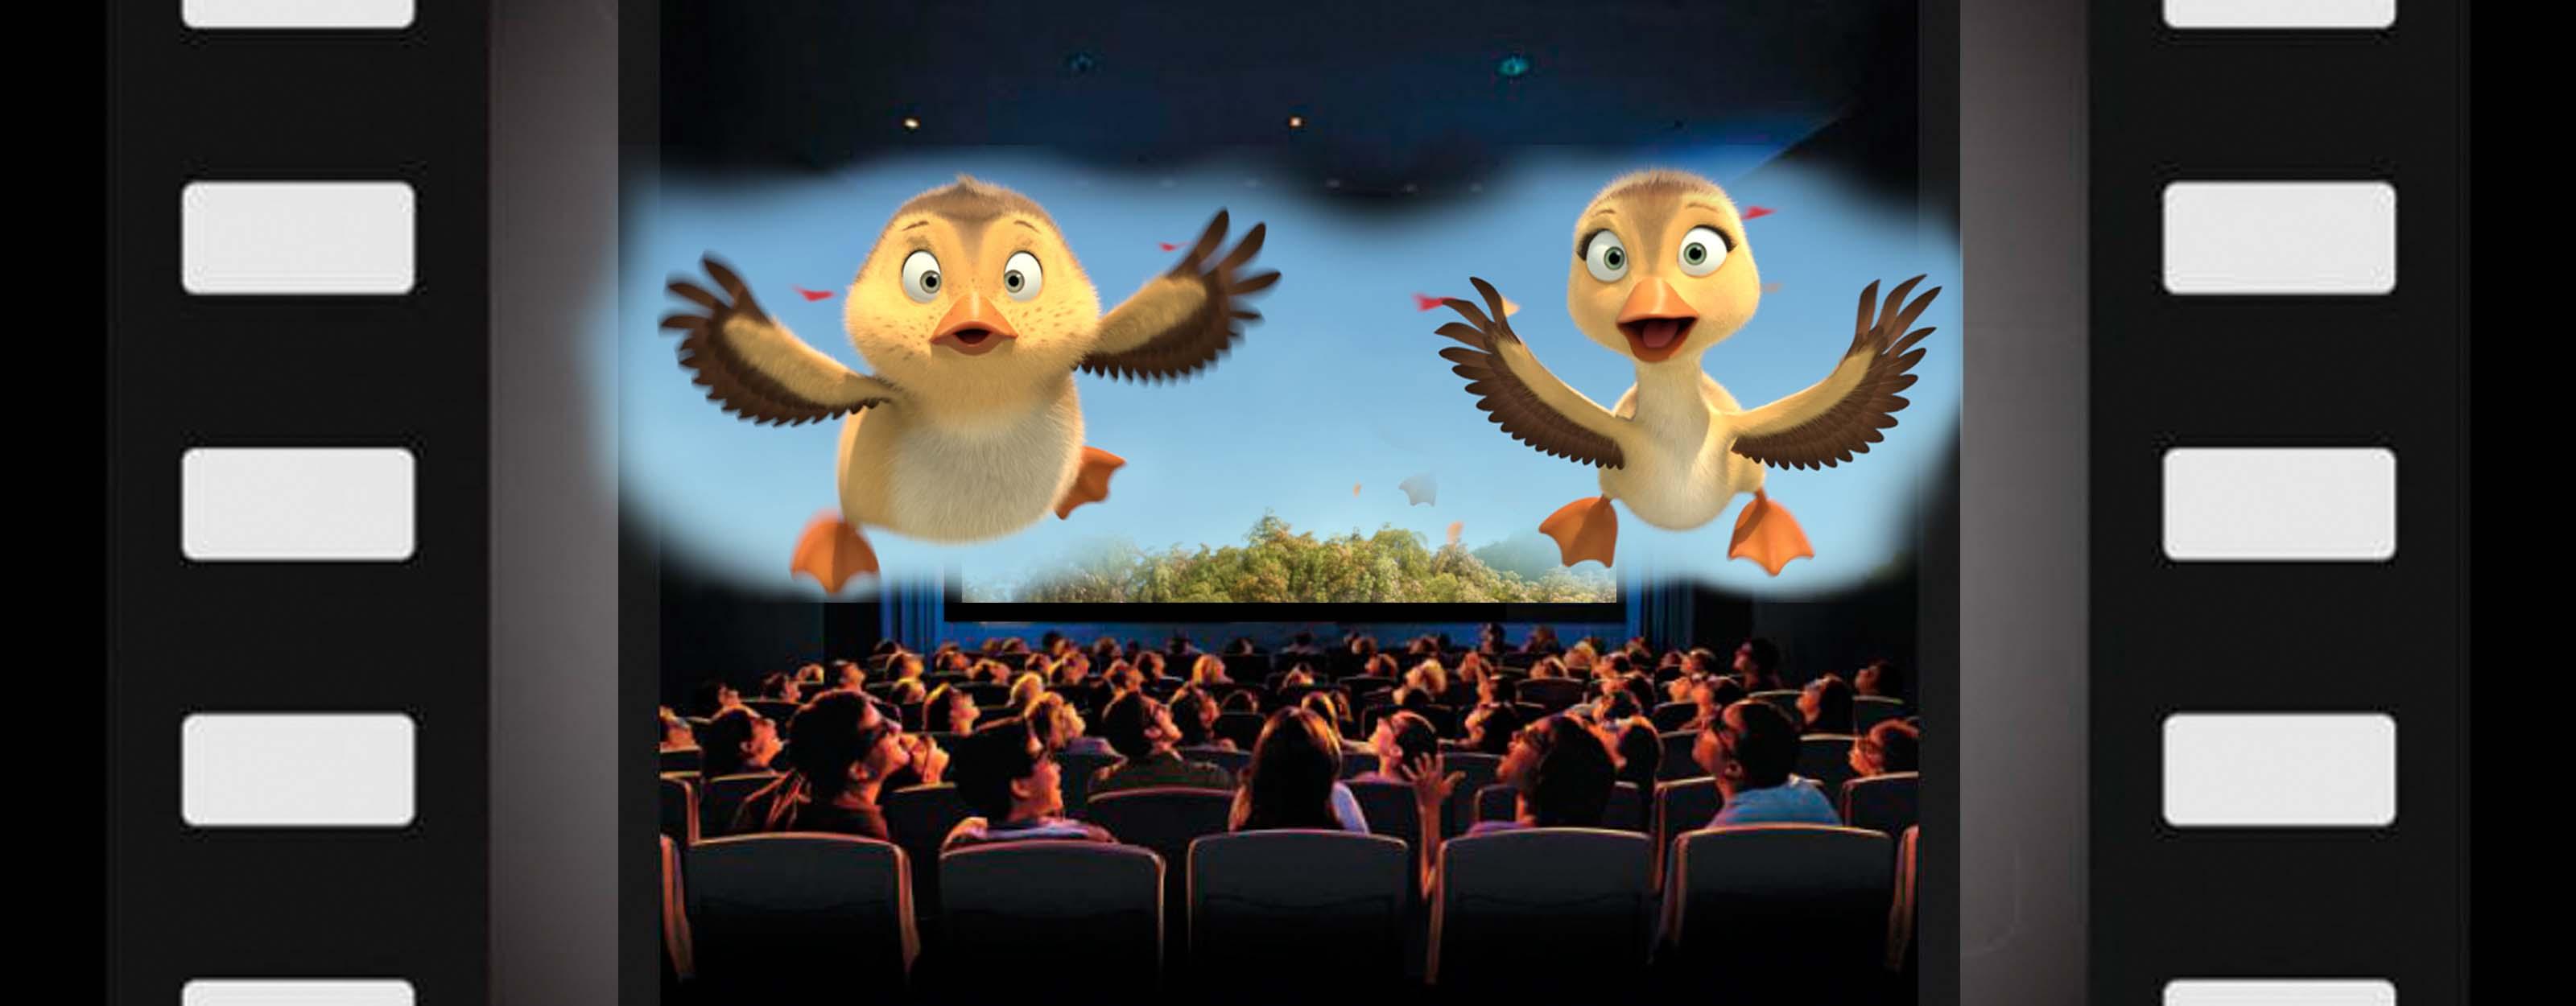 Al aire patos cine familiar gratis